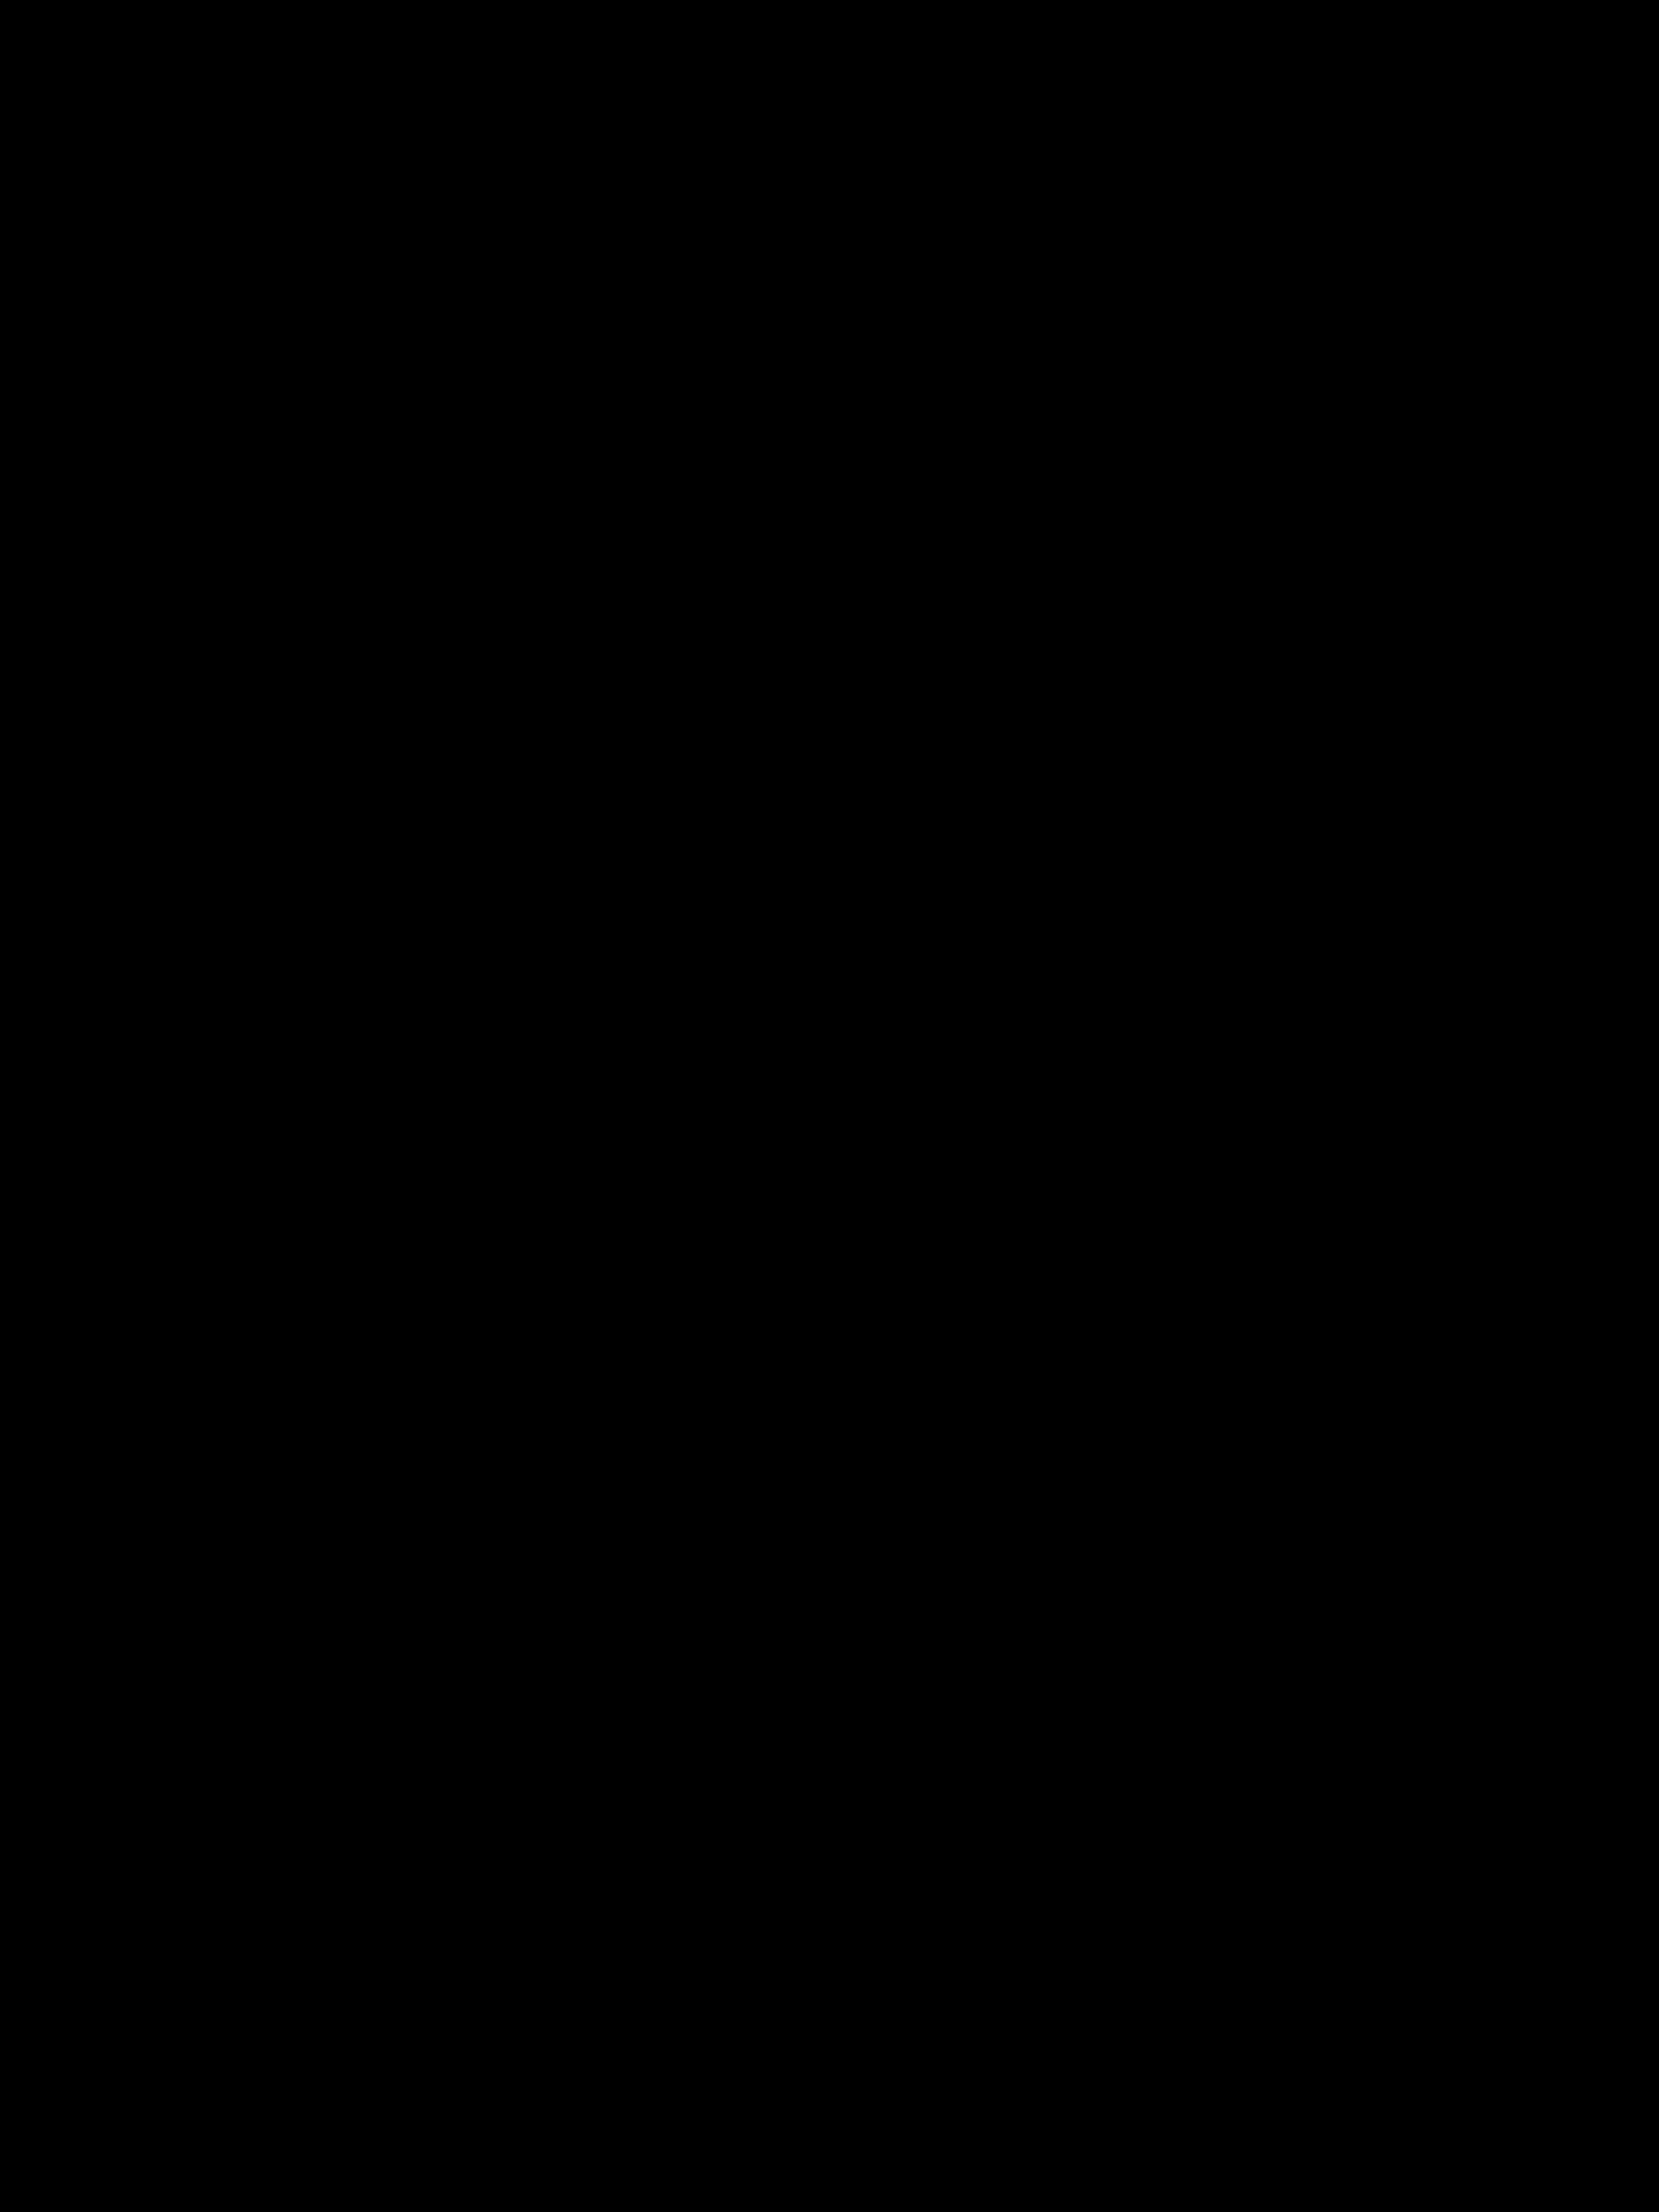 banner transparent download Cross clipart black.  units of images